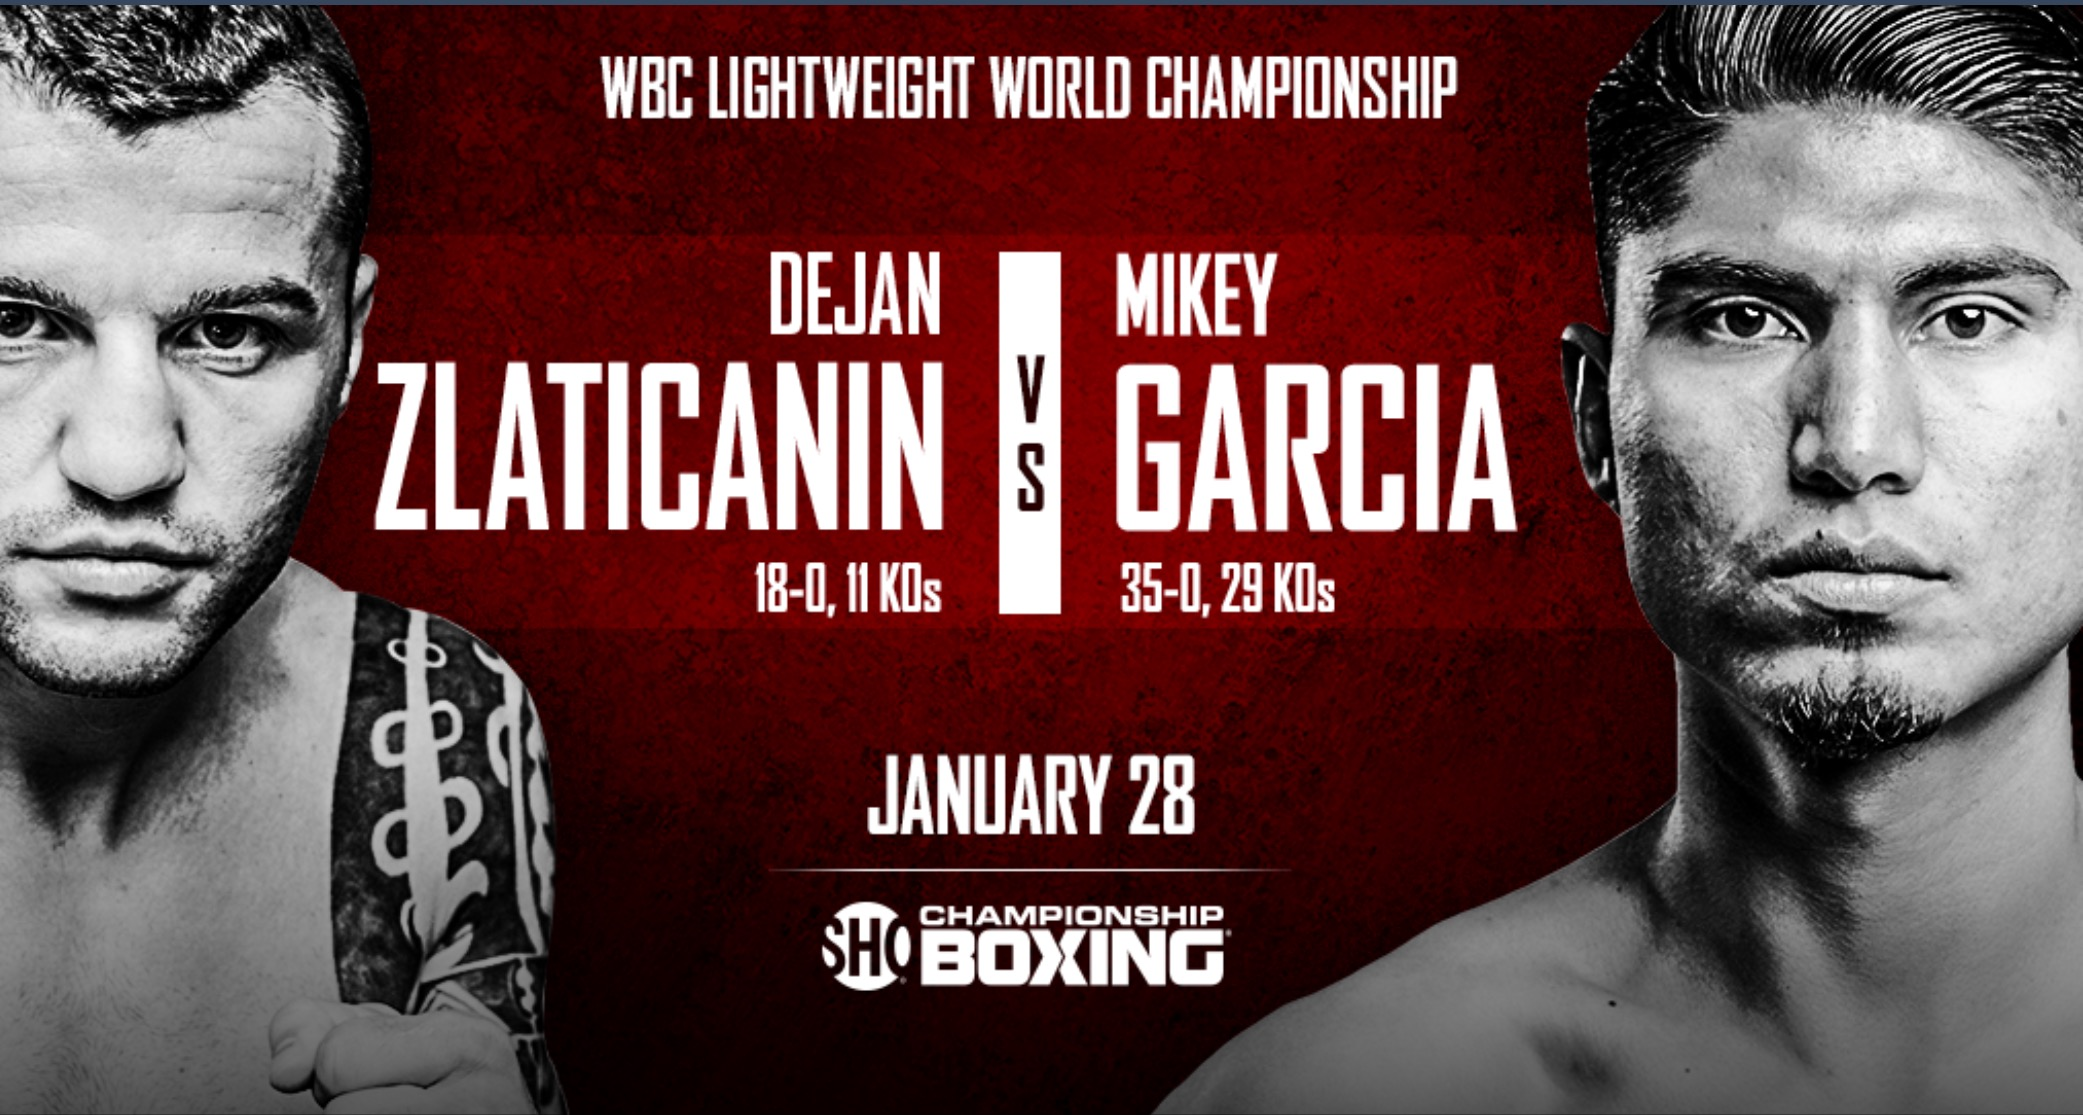 Dejan Zlaticanin vs. Mikey Garcia will take place on January 28th. Photo: Showtime Sports